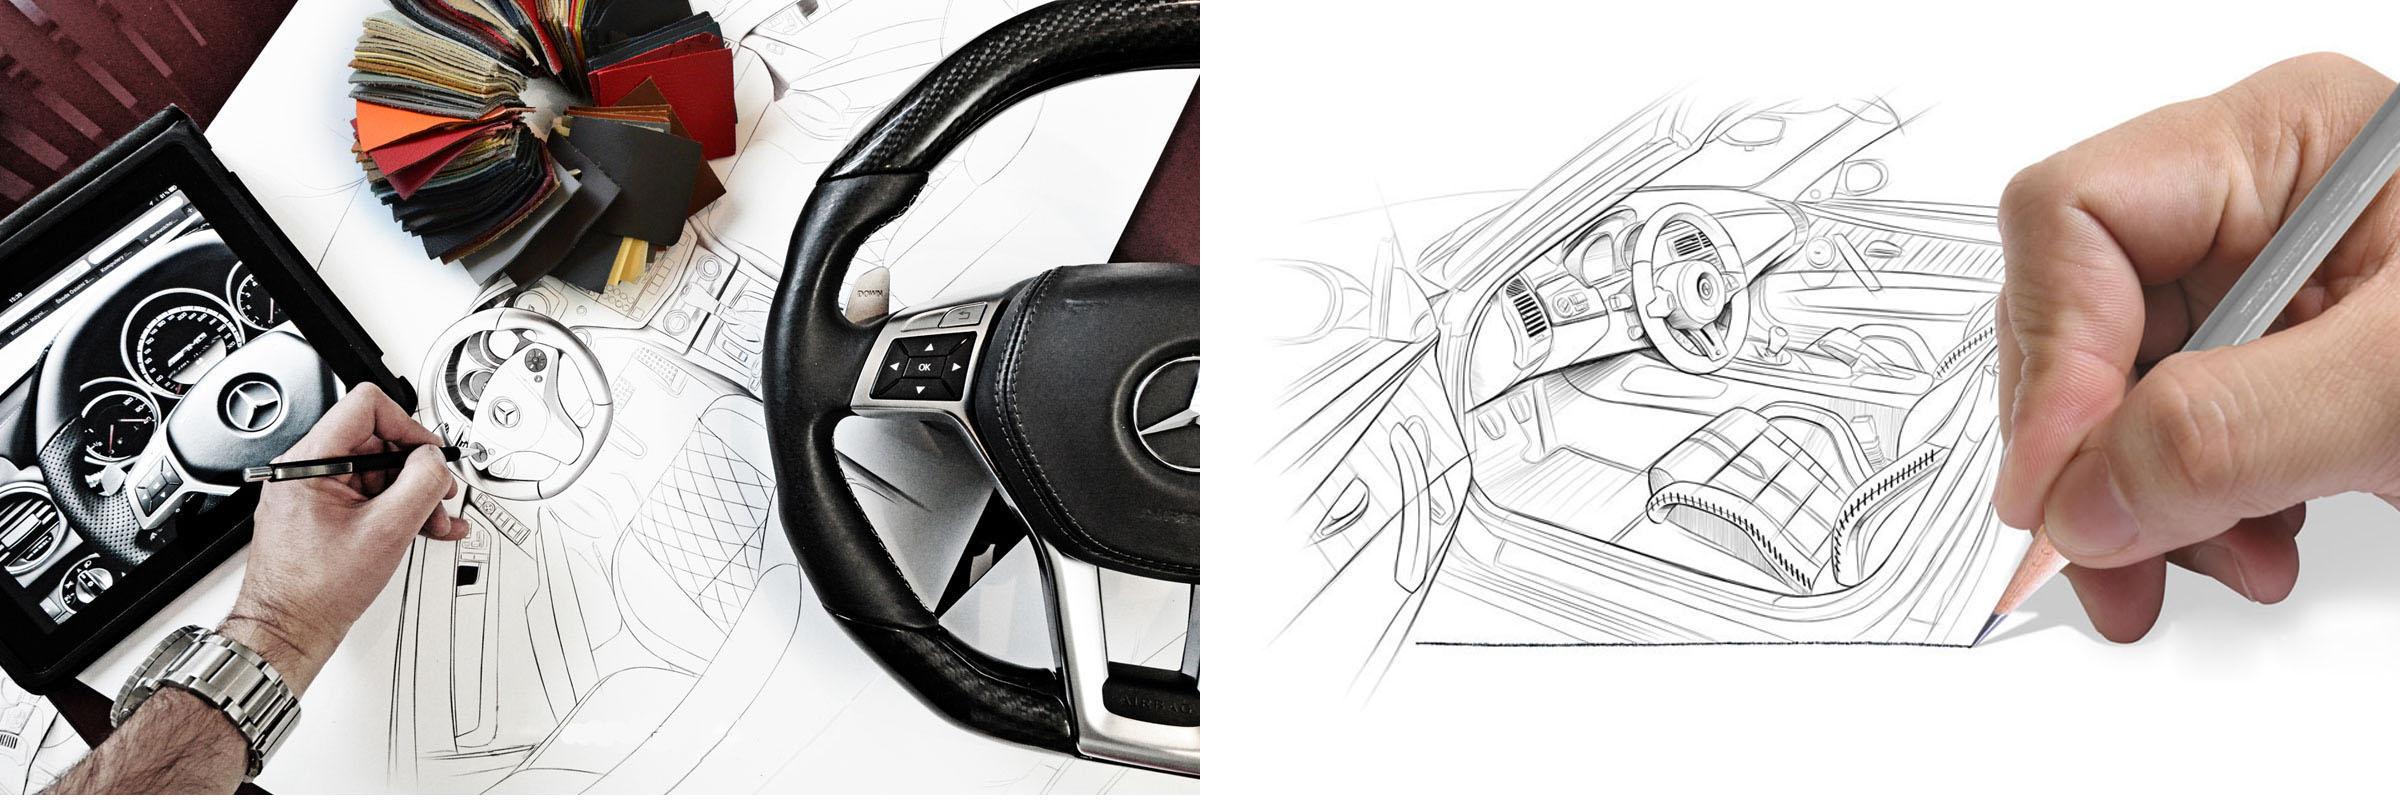 دیزاین خودرو